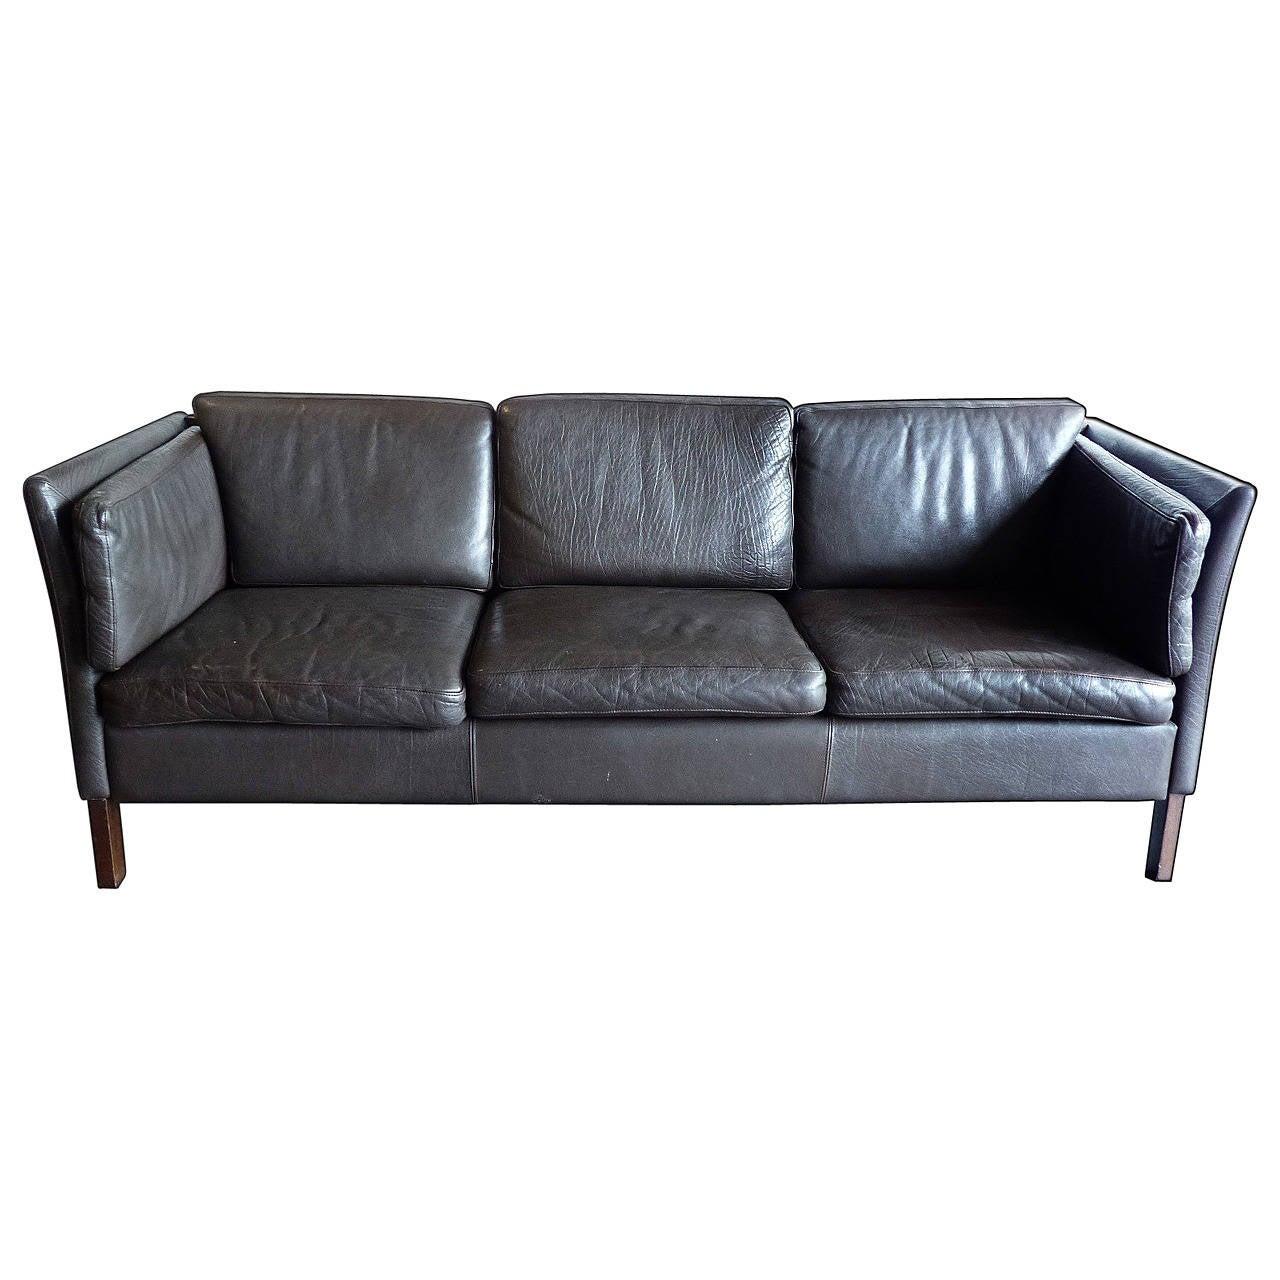 Leather mid century modern sofa at 1stdibs - Vancouver mid century modern furniture ...